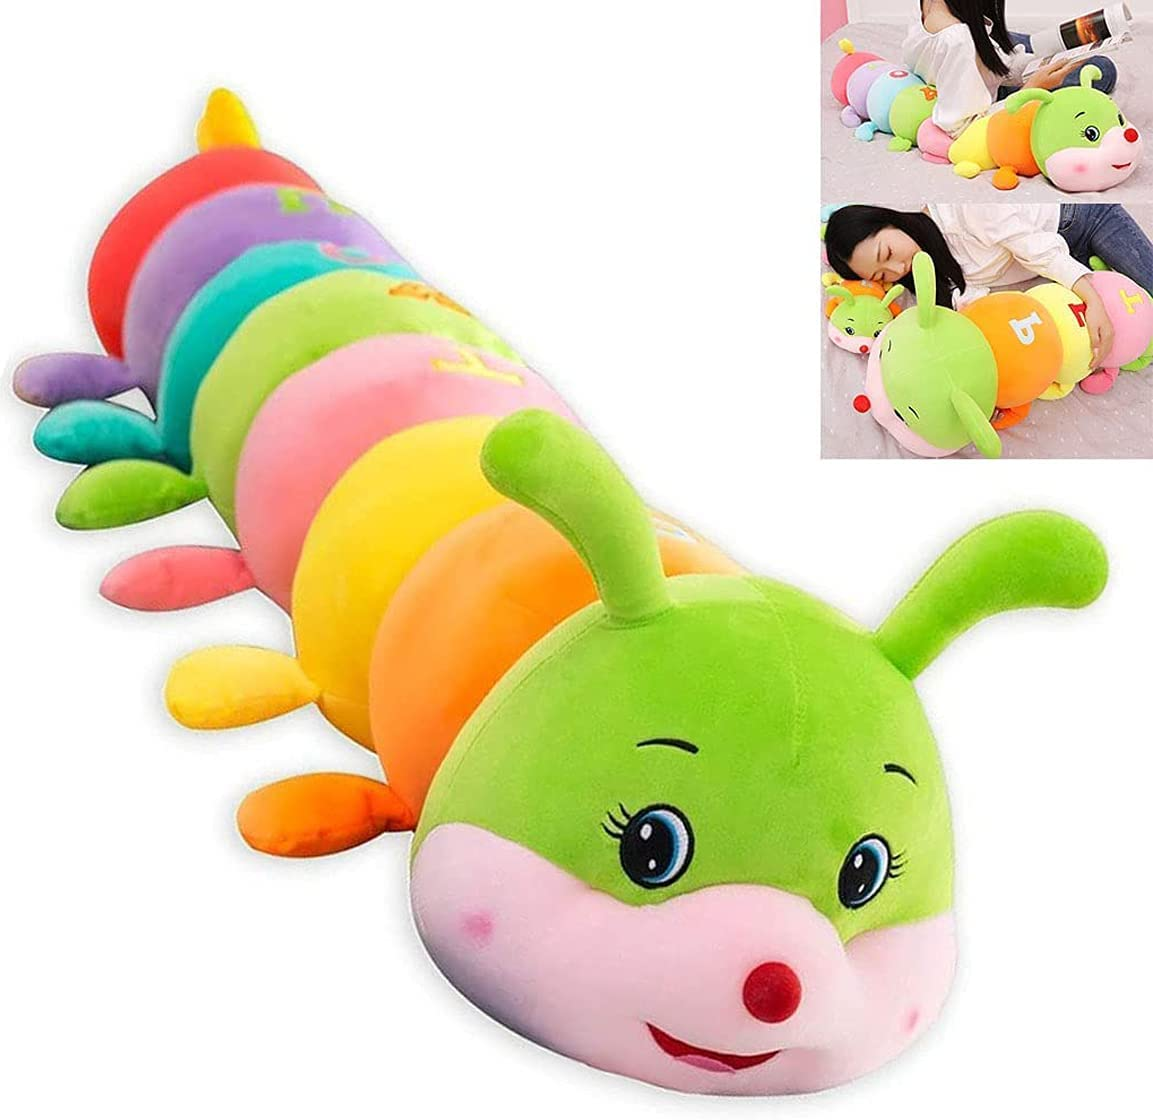 YWSM Cute Popular Fees free!! product Letter Caterpillar Toy Plush Cu